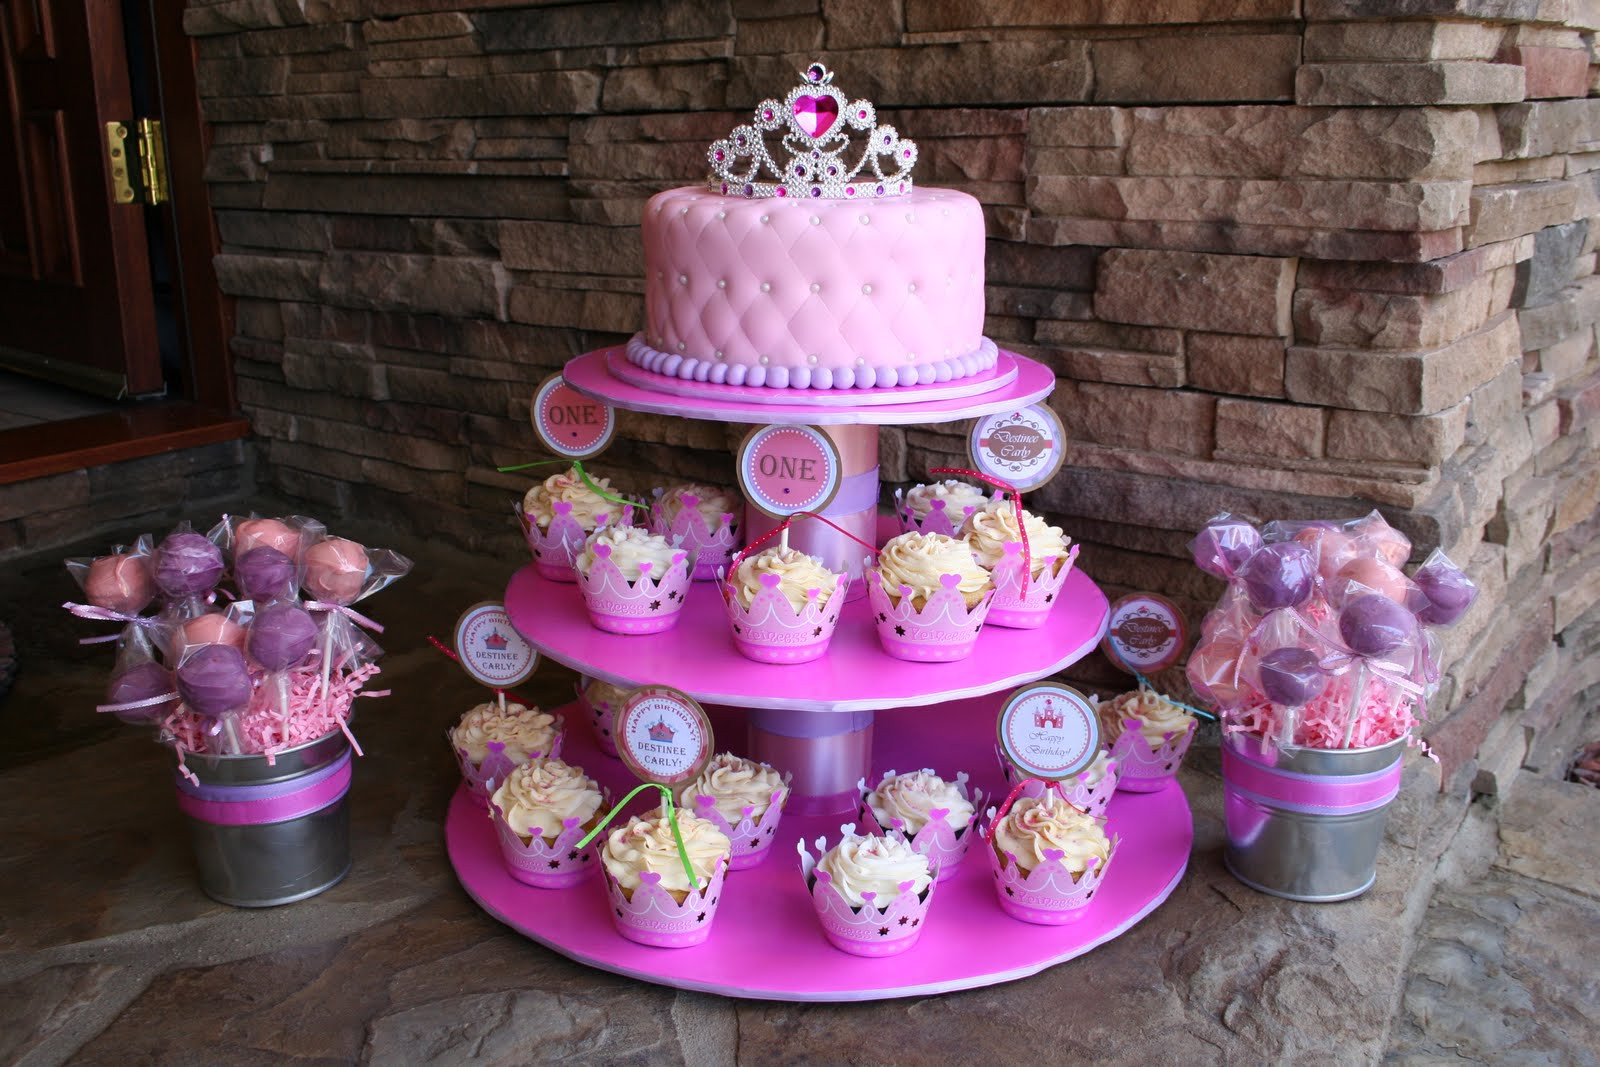 Princess 1st Birthday Cake  cakes by narleen kristel a princess 1st birthday